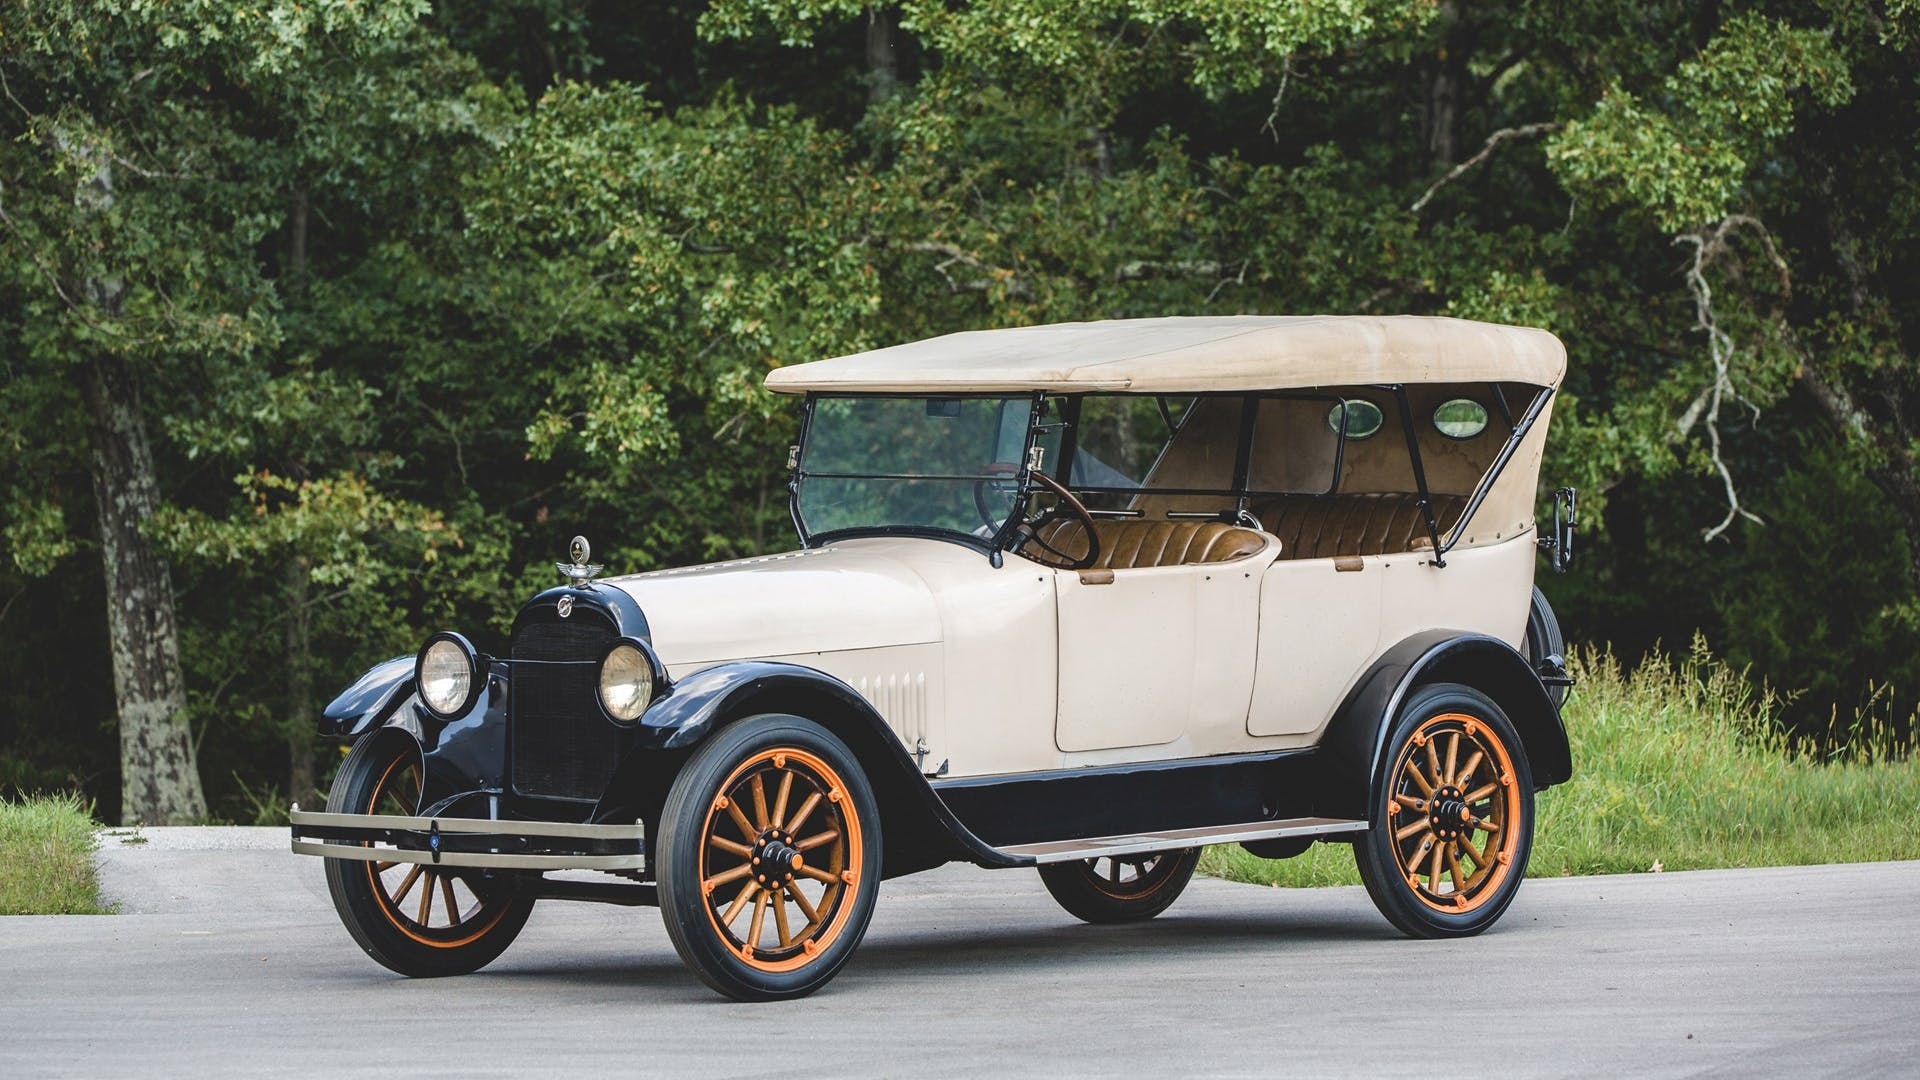 1919 Studebaker Light Six Touring